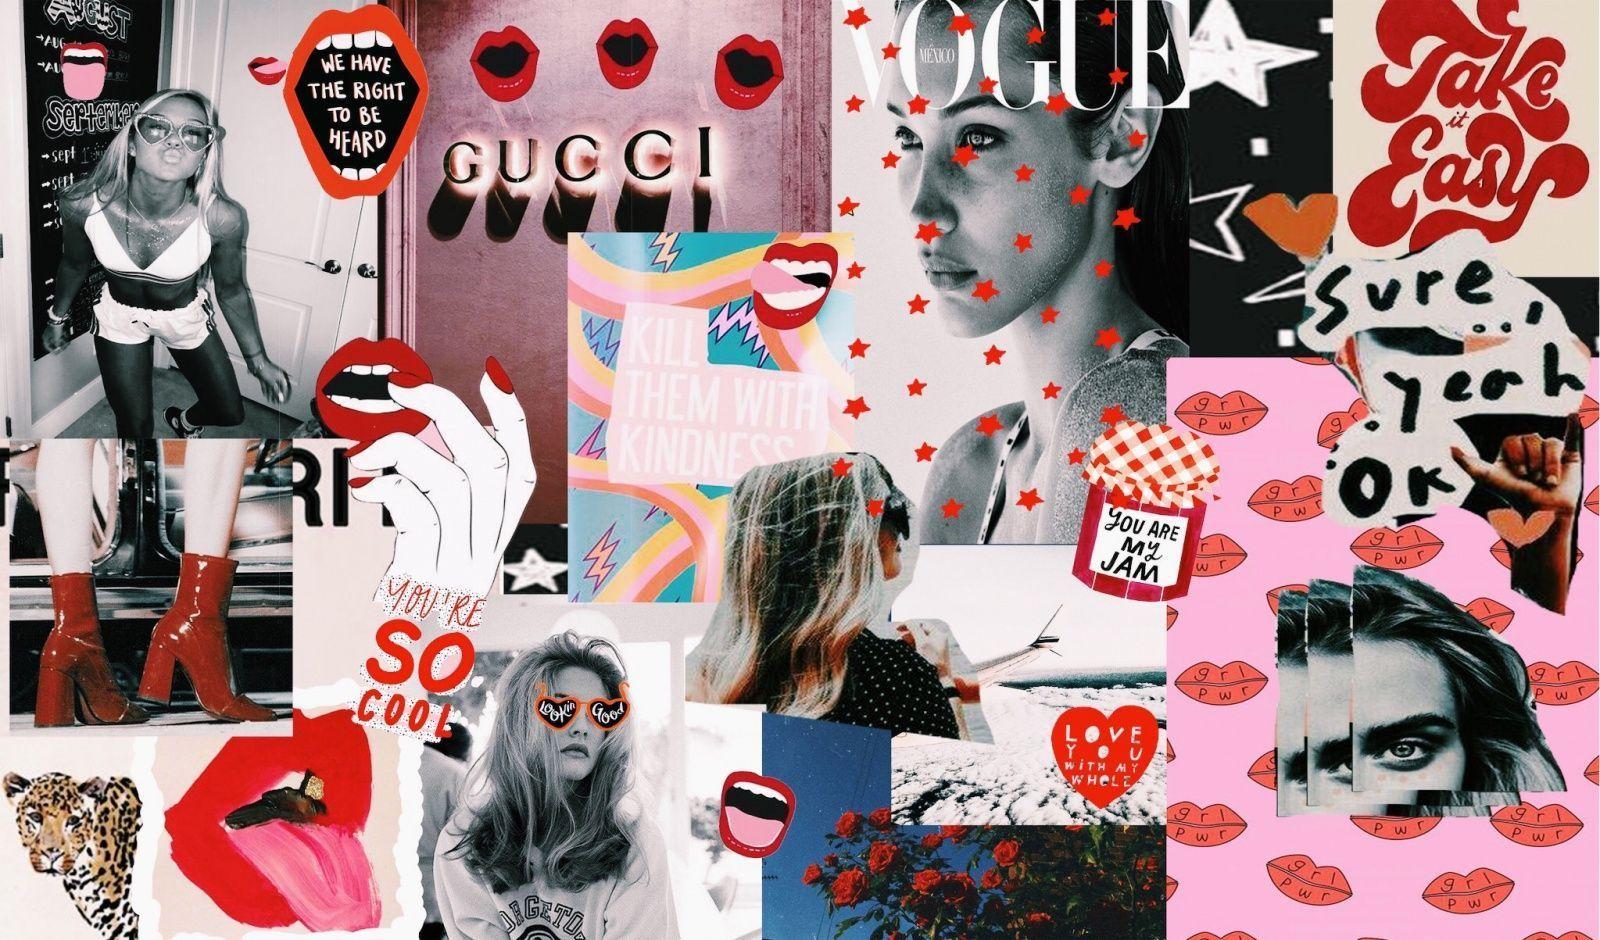 Vsco Gurl Laptop Wallpaper Desktop Wallpapers Computer Wallpaper Desktop Wallpapers Laptop Wallpaper